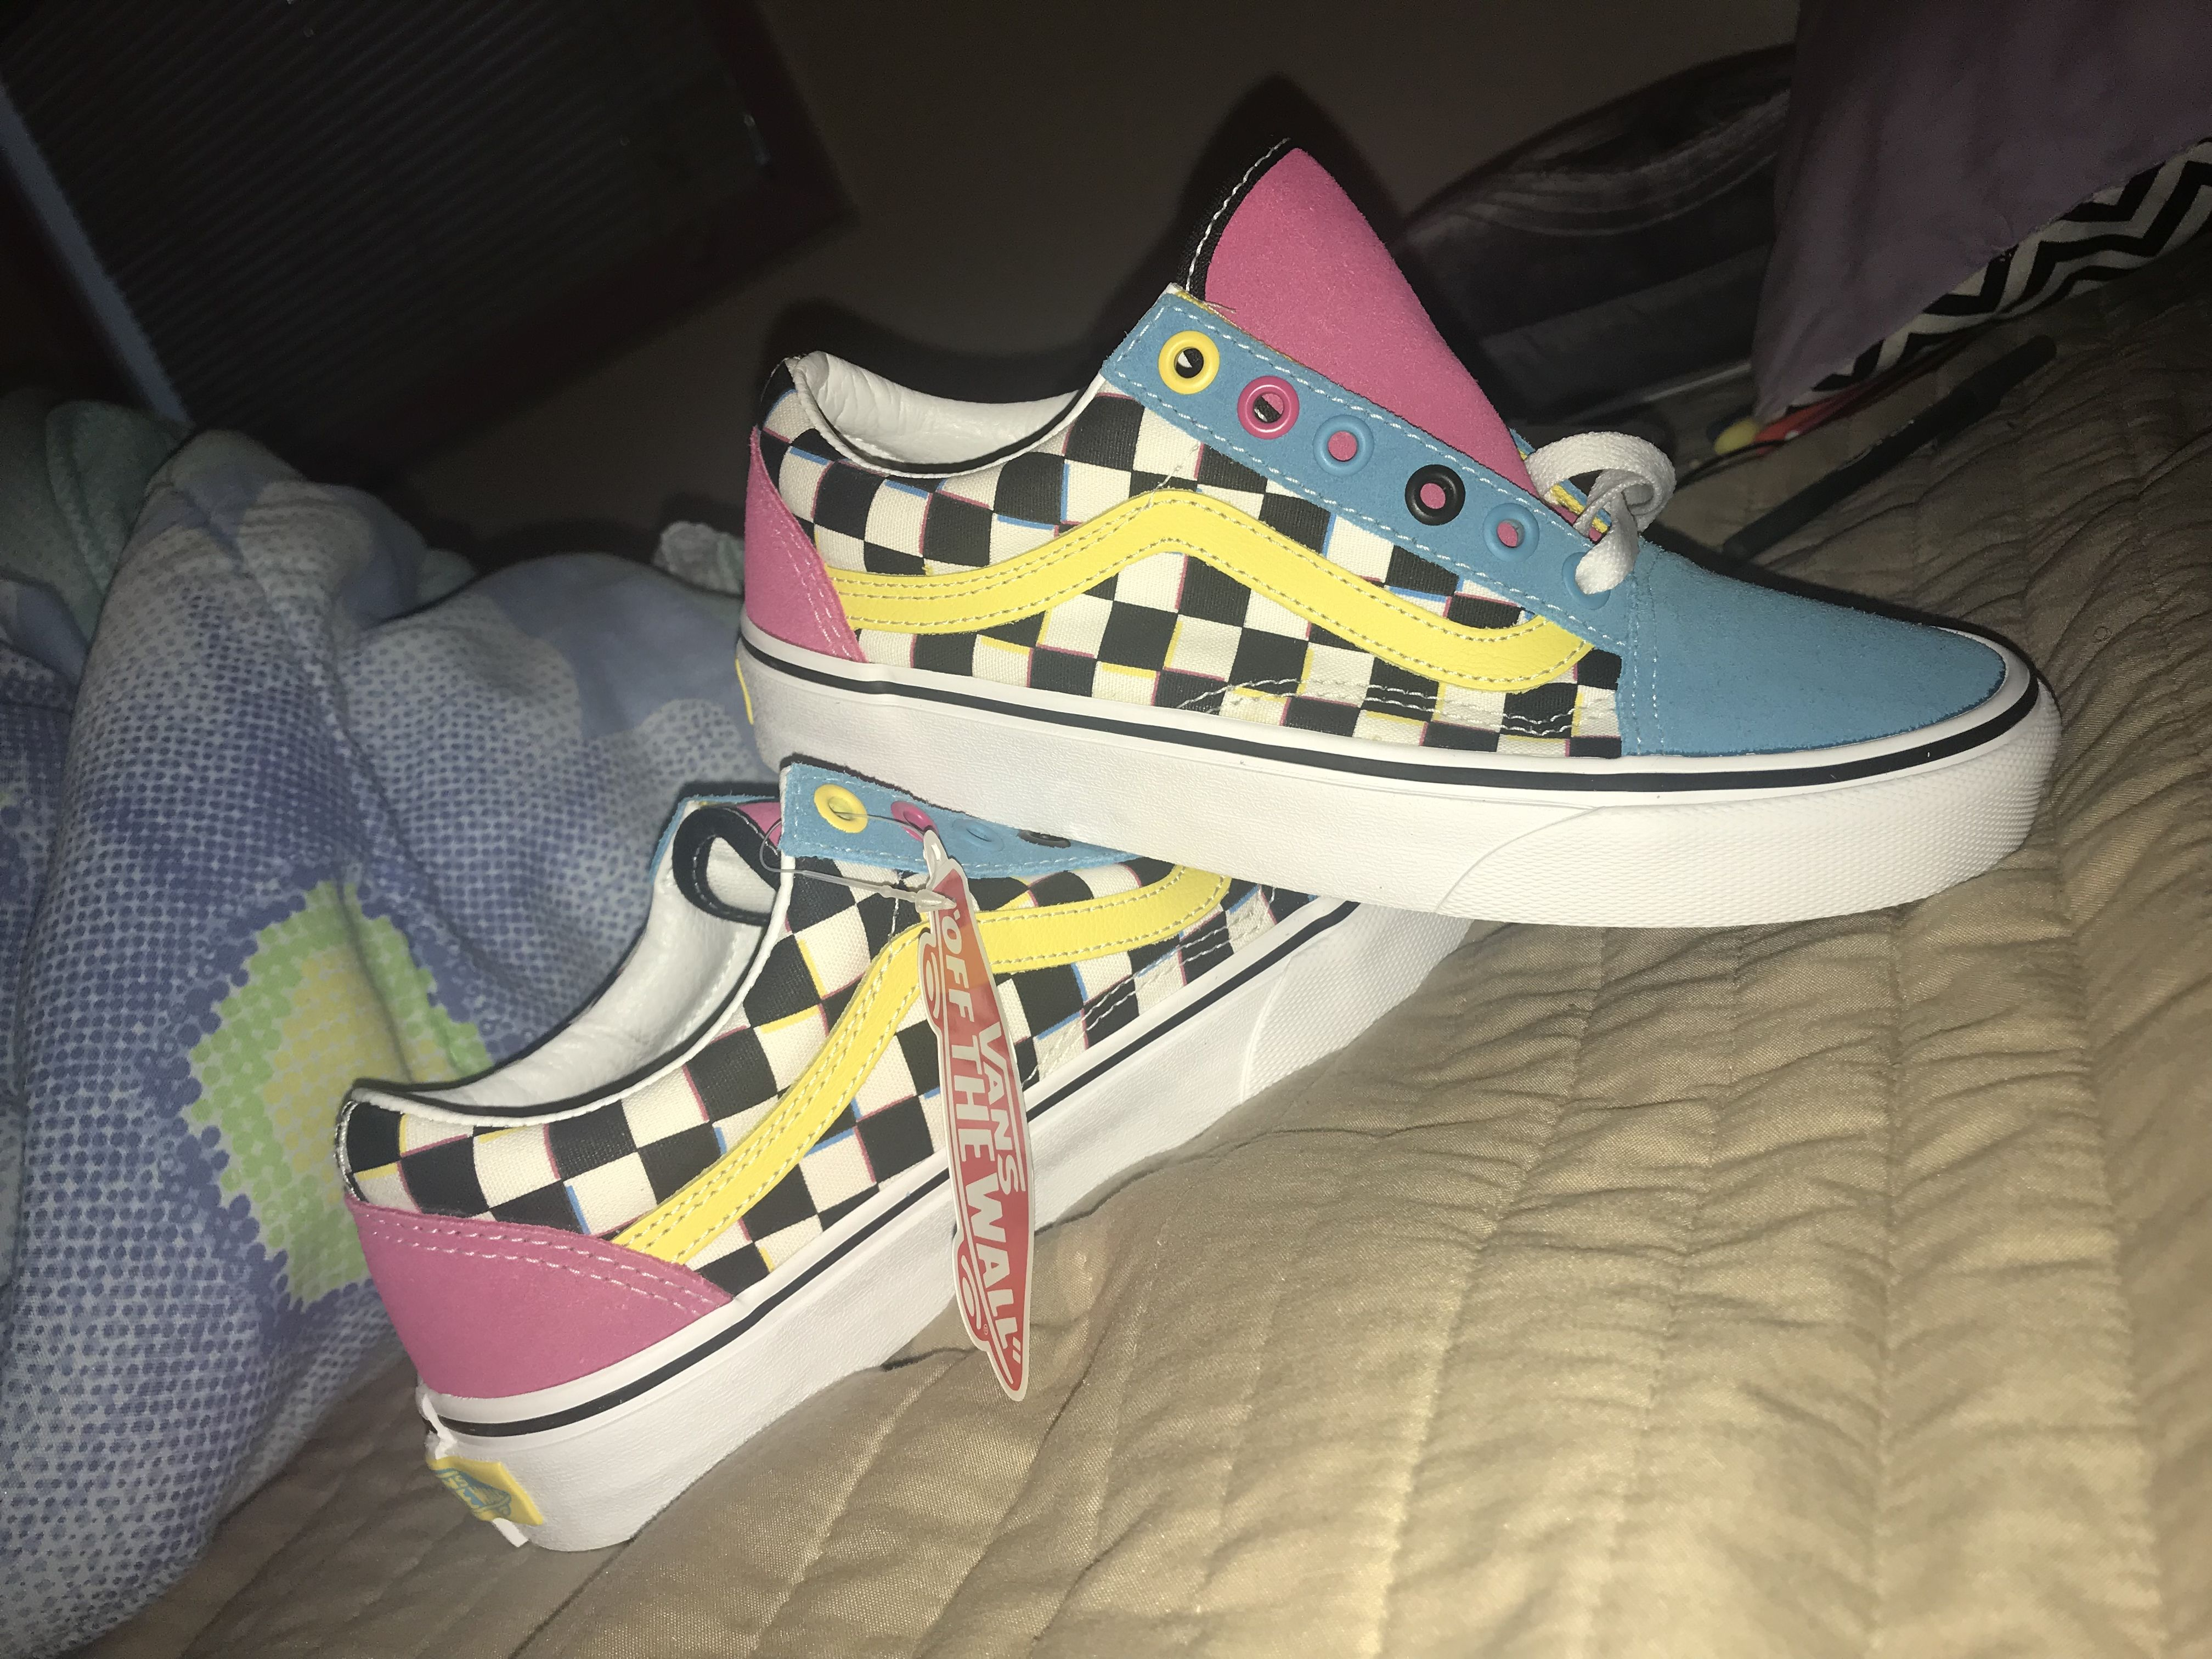 Vans Old Skool Chex Skate Shoe | Shoes